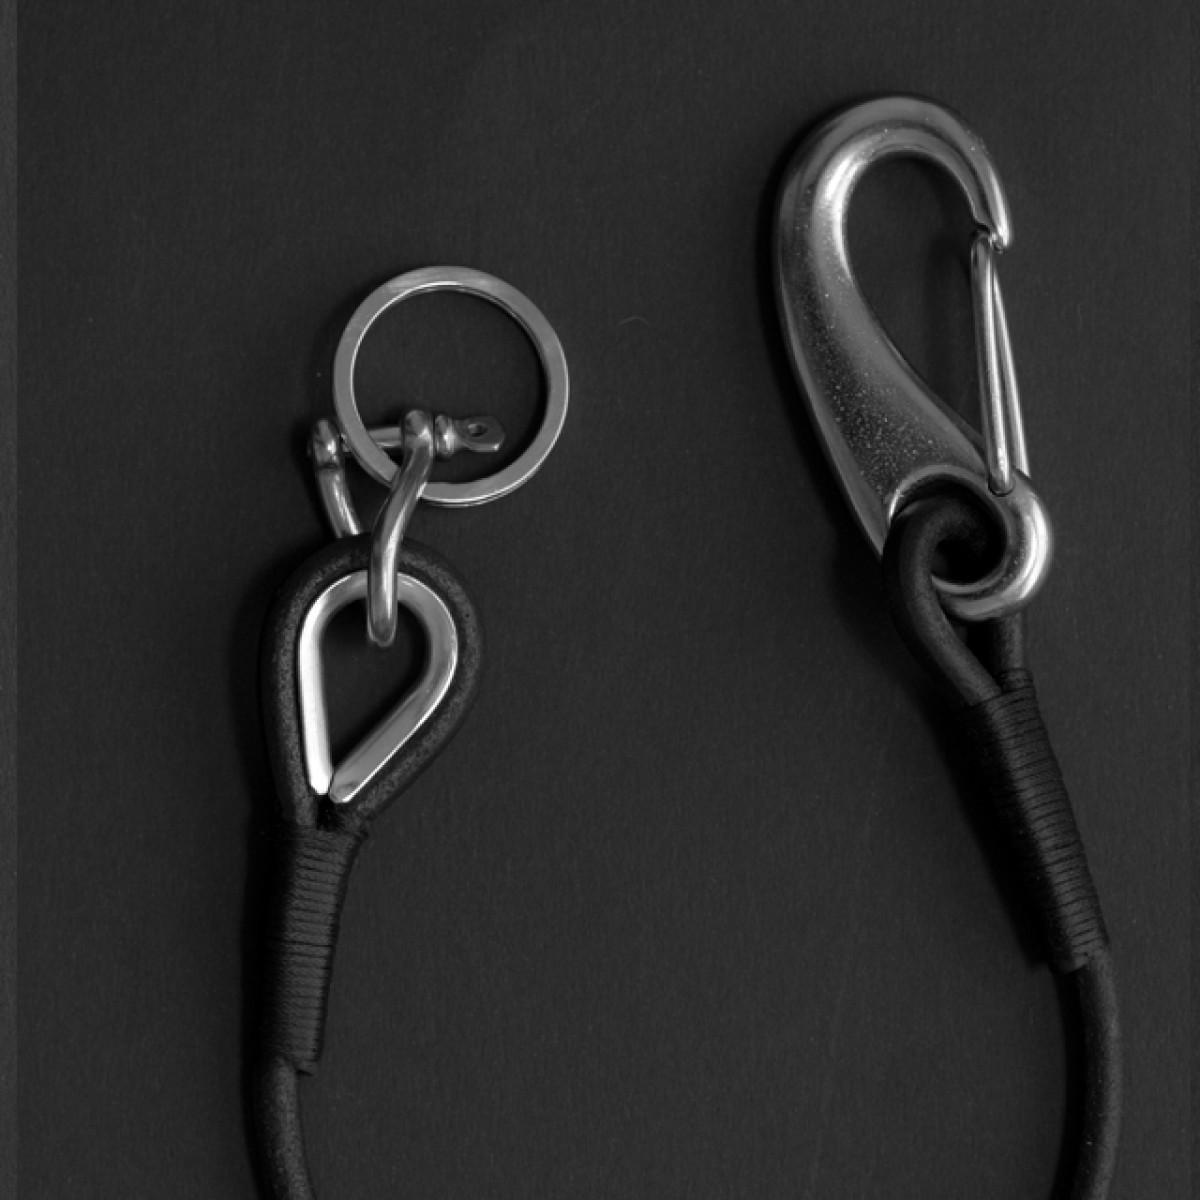 key leash